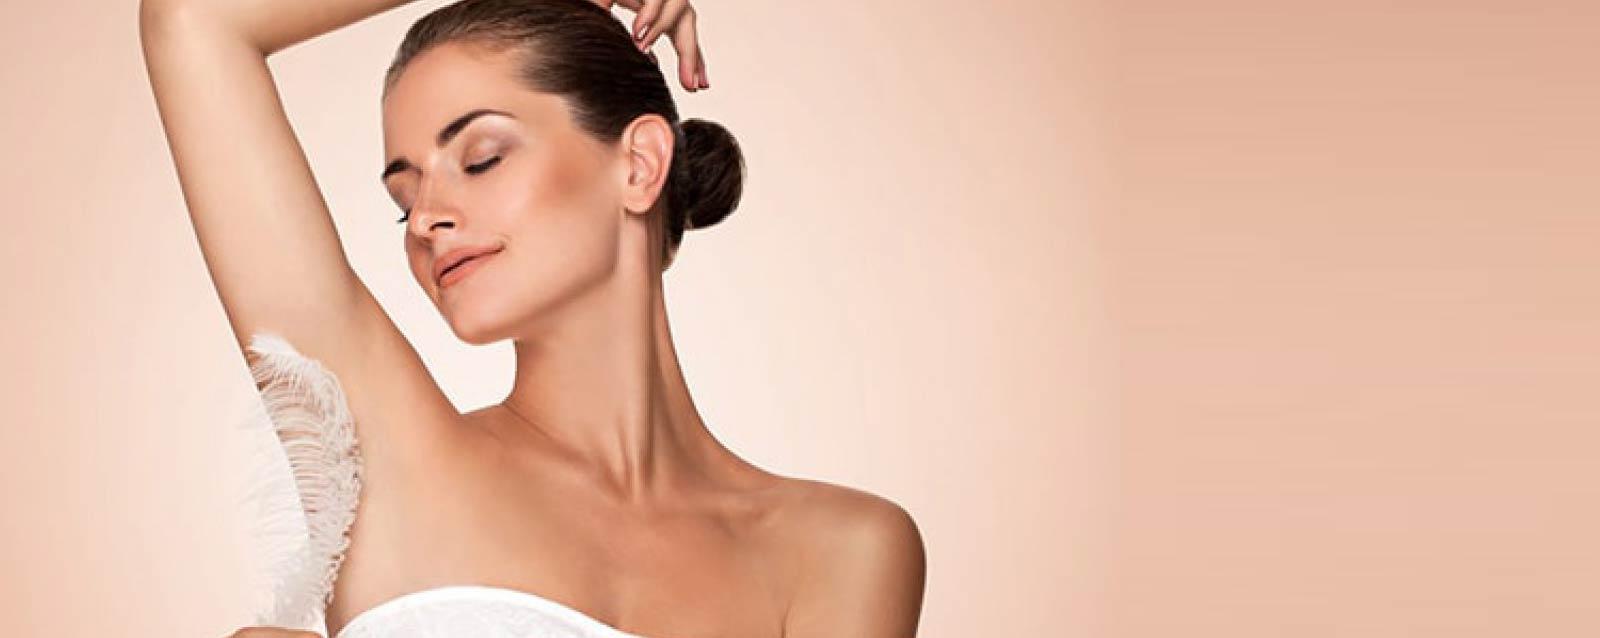 Protocolo: Estética Íntima: Intimate Whitening Clareamento